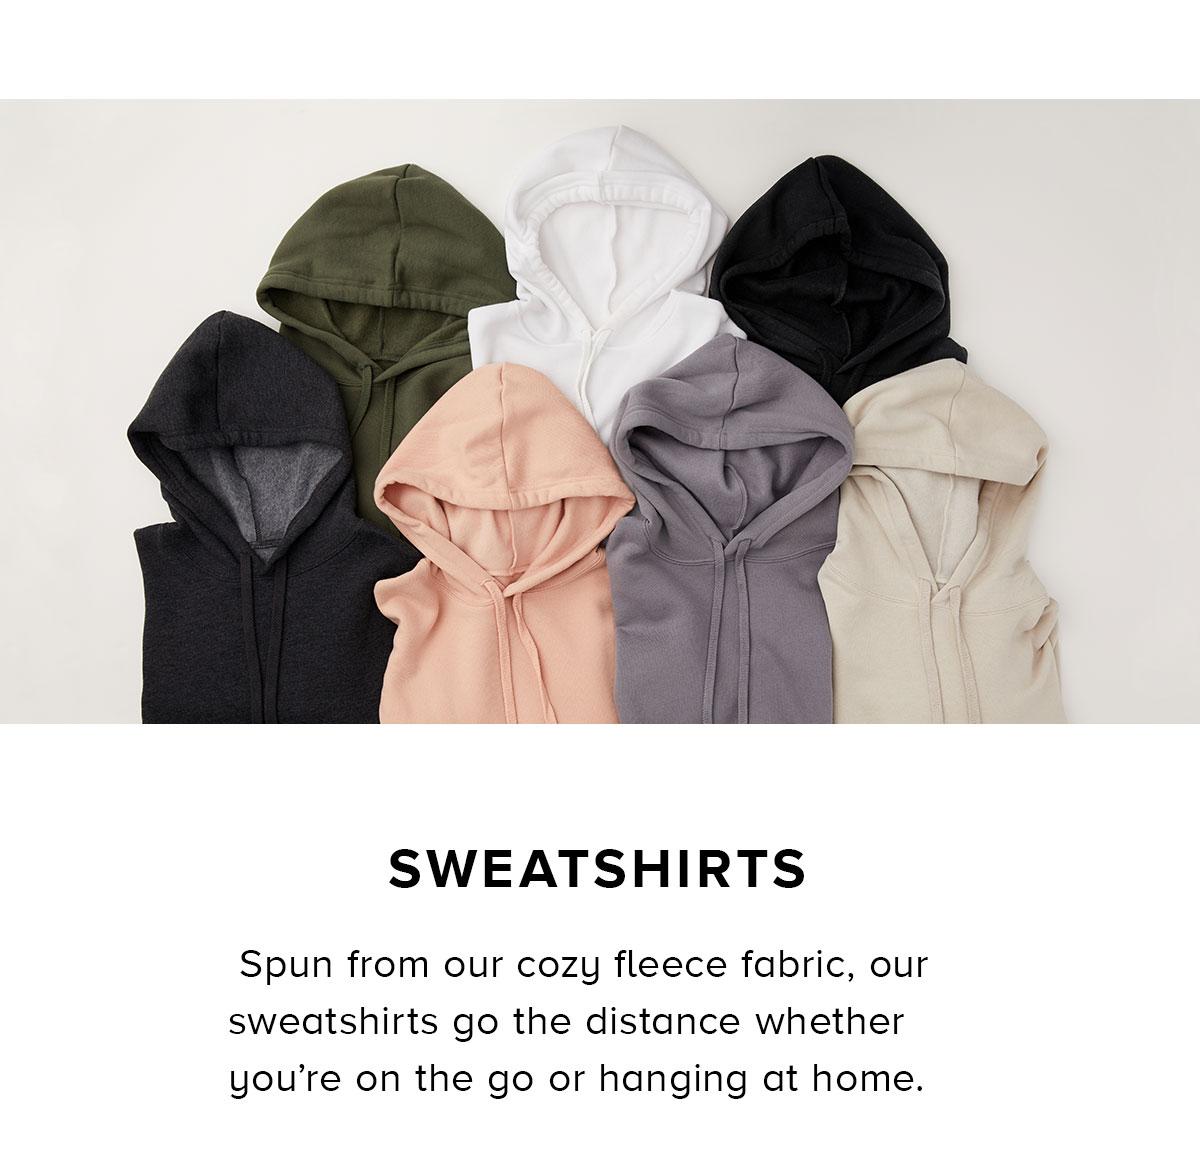 SWEATSHIRTS Spun from our cozy fleece fabric